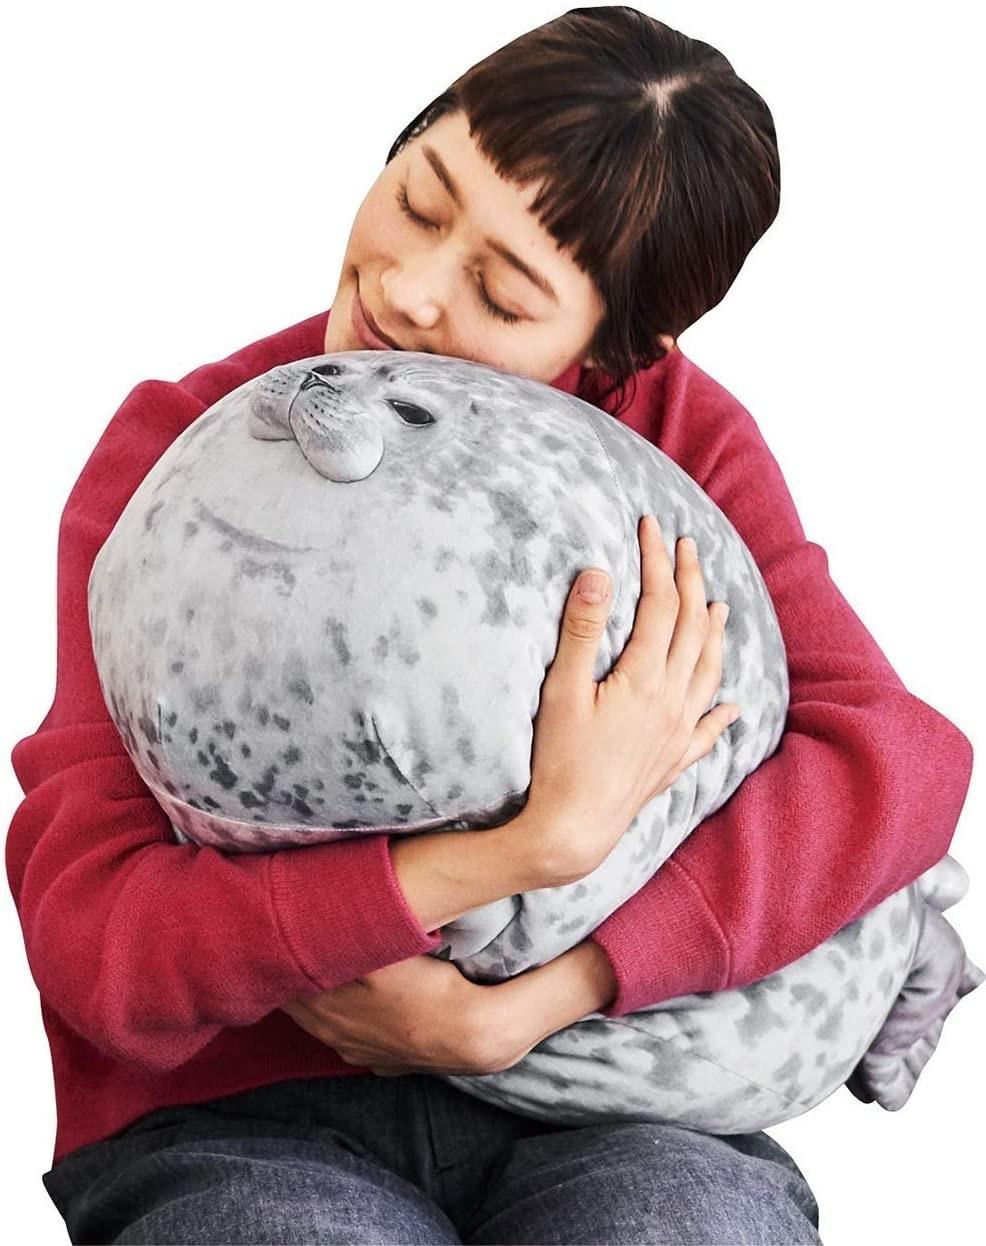 A model hugs the stuffed seal